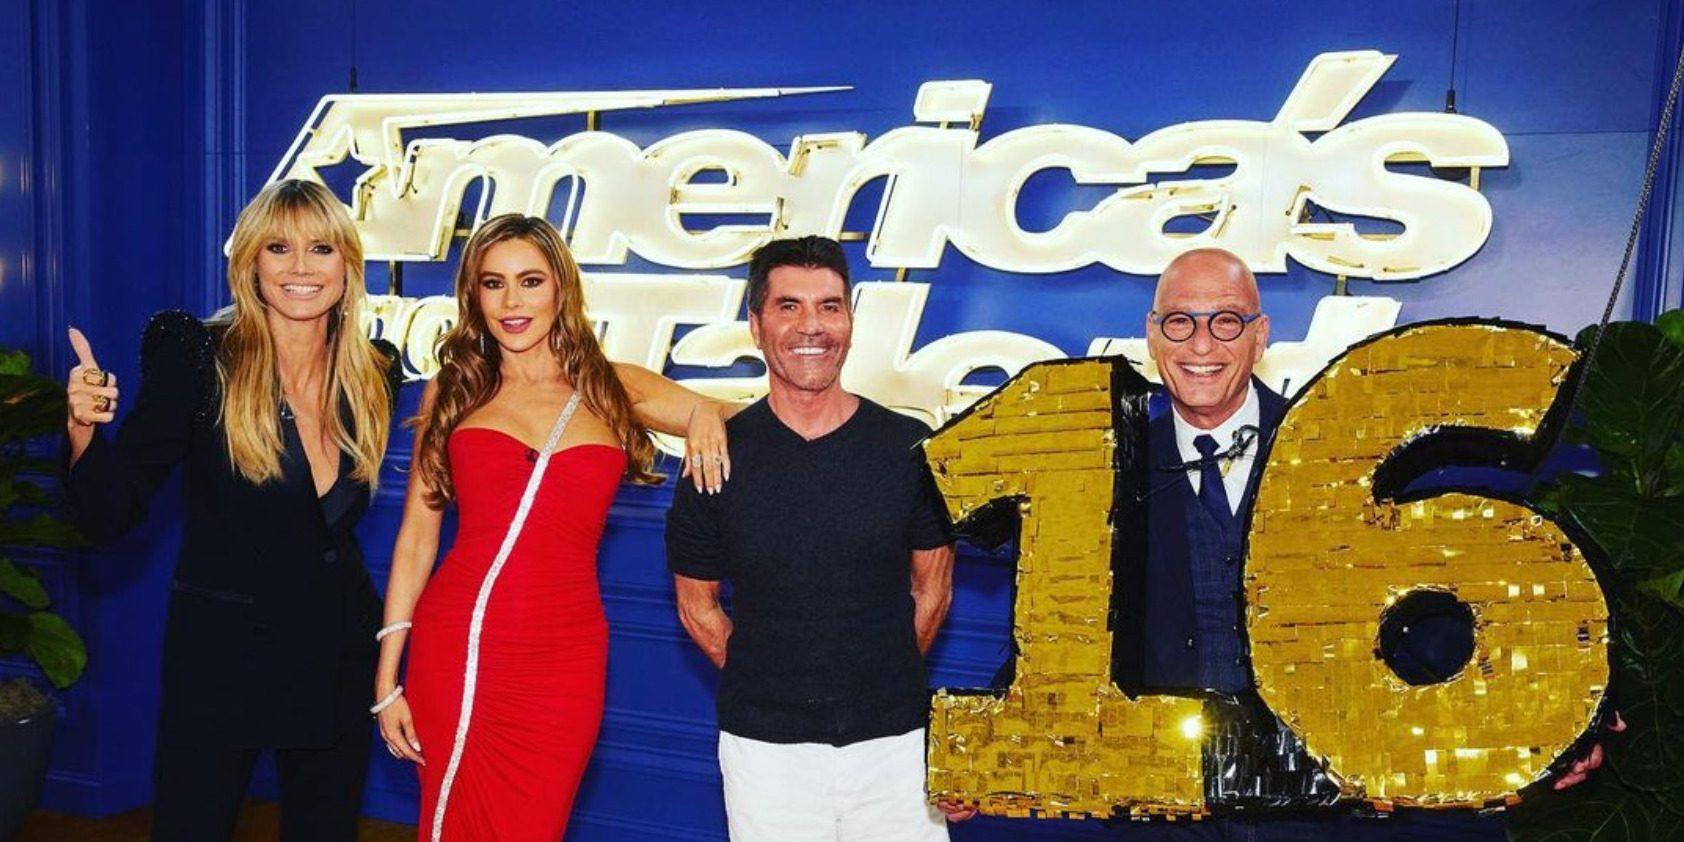 America's Got Talent Season 16 Episode 9